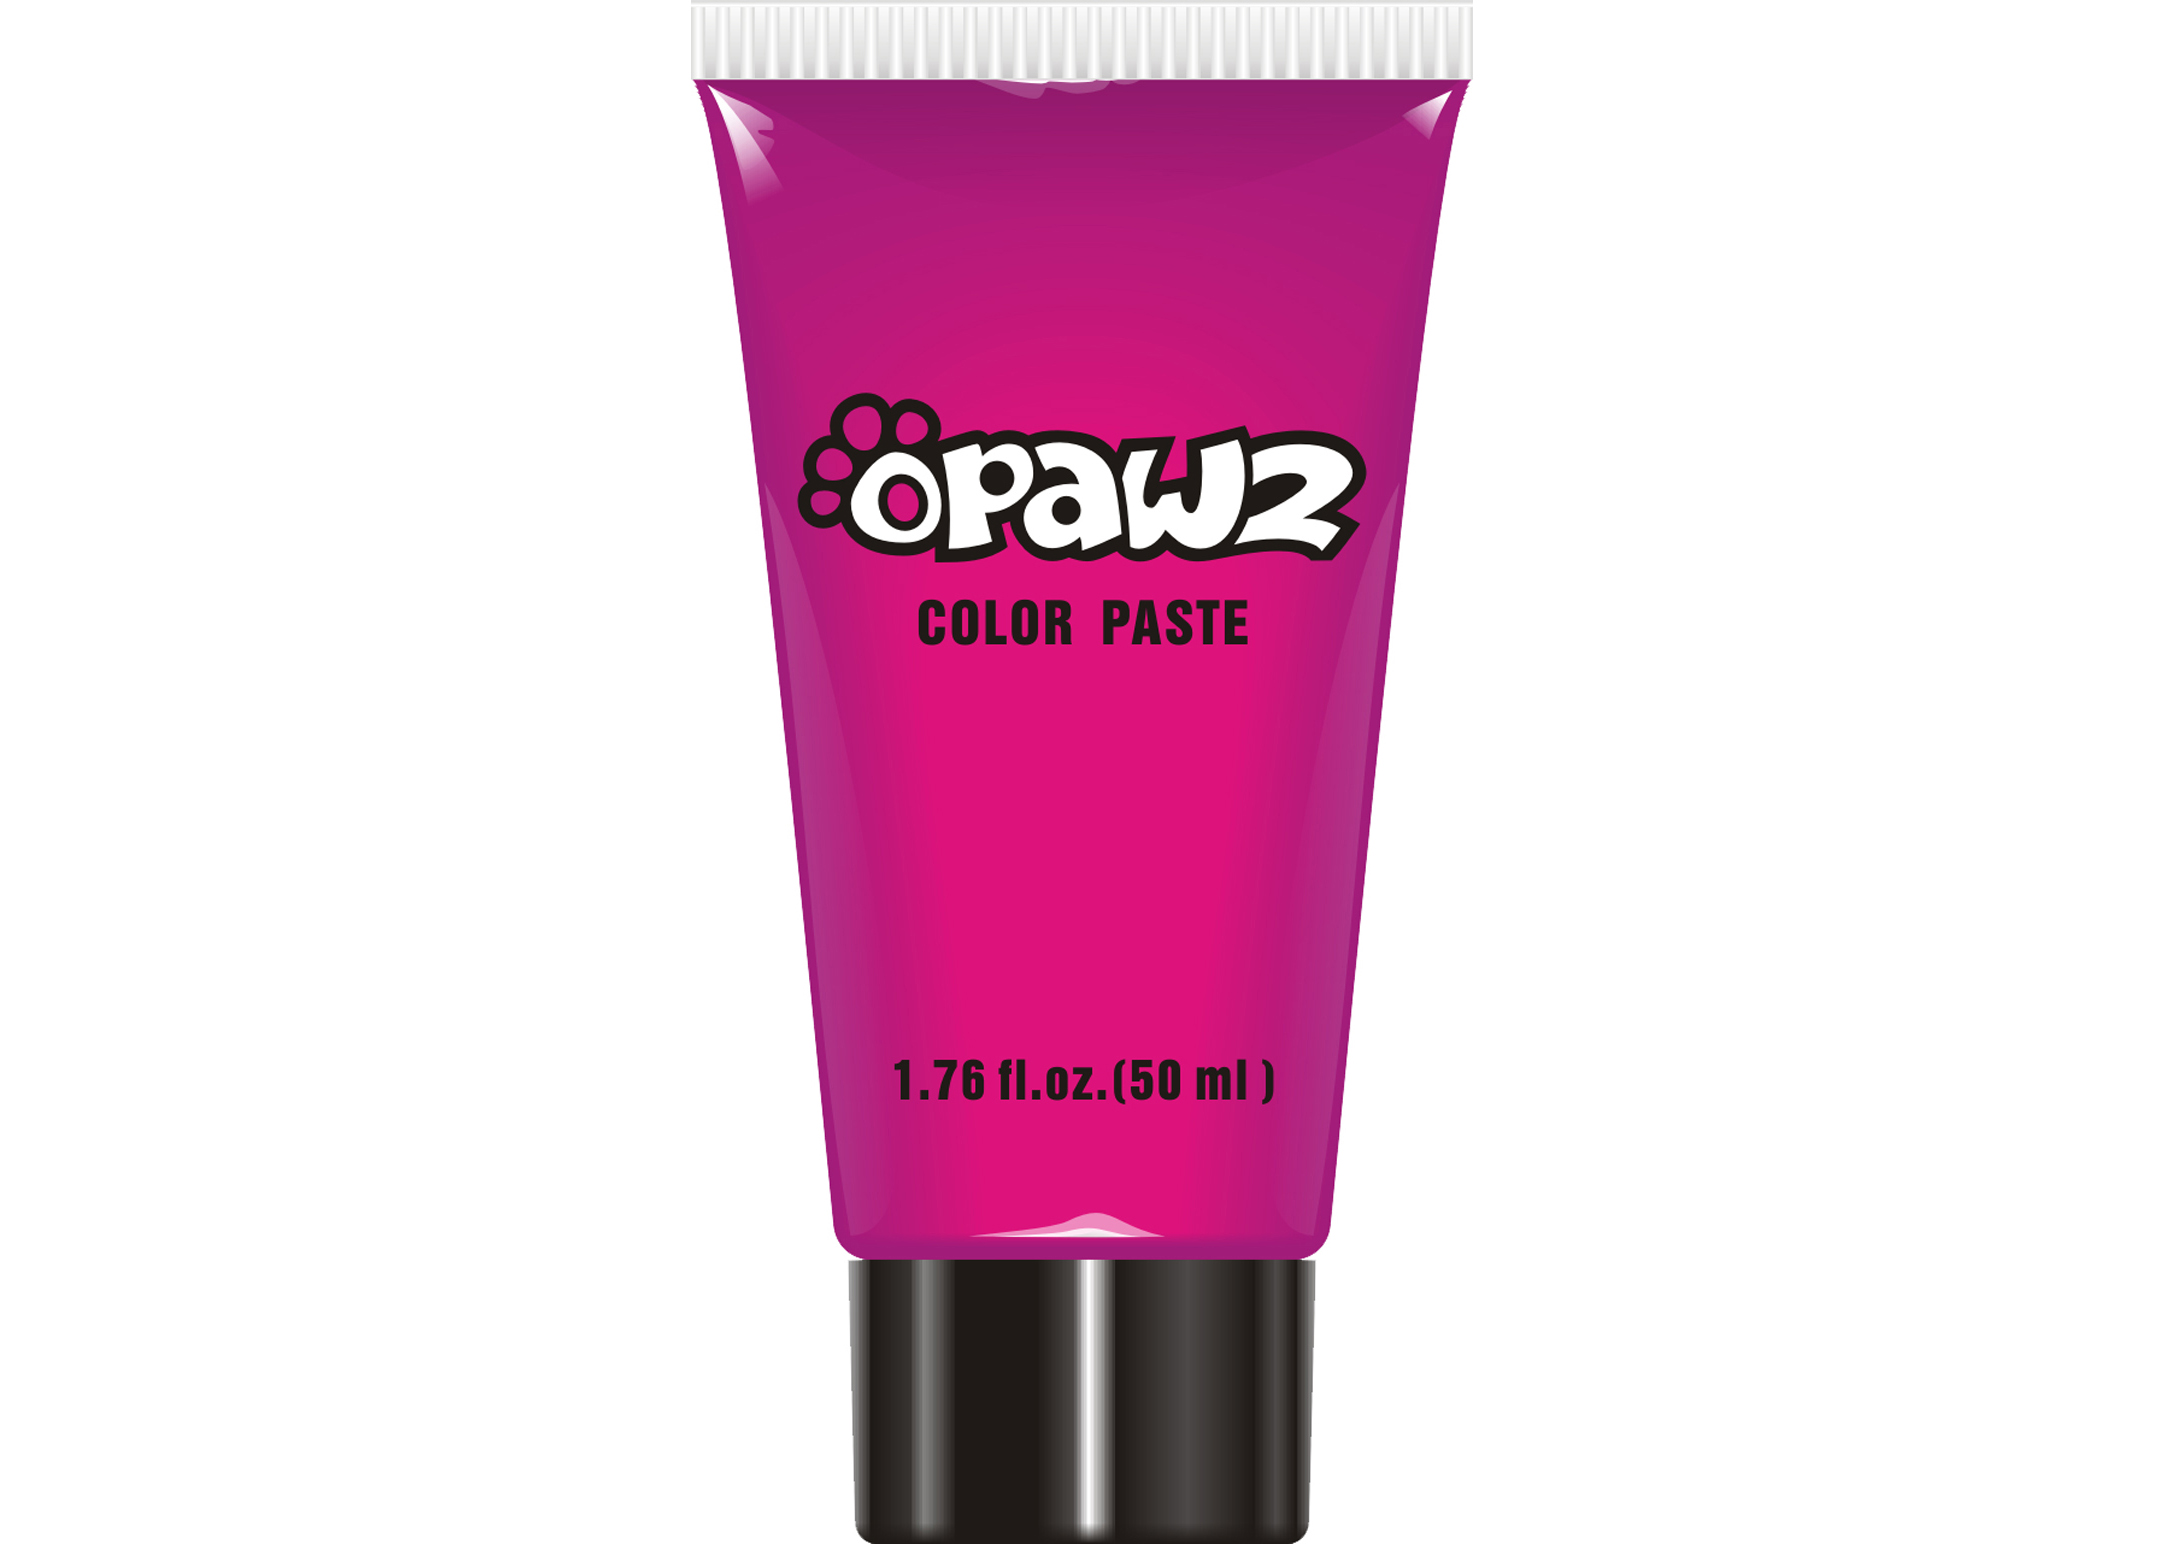 Opawz Color Paste Pink 50ml